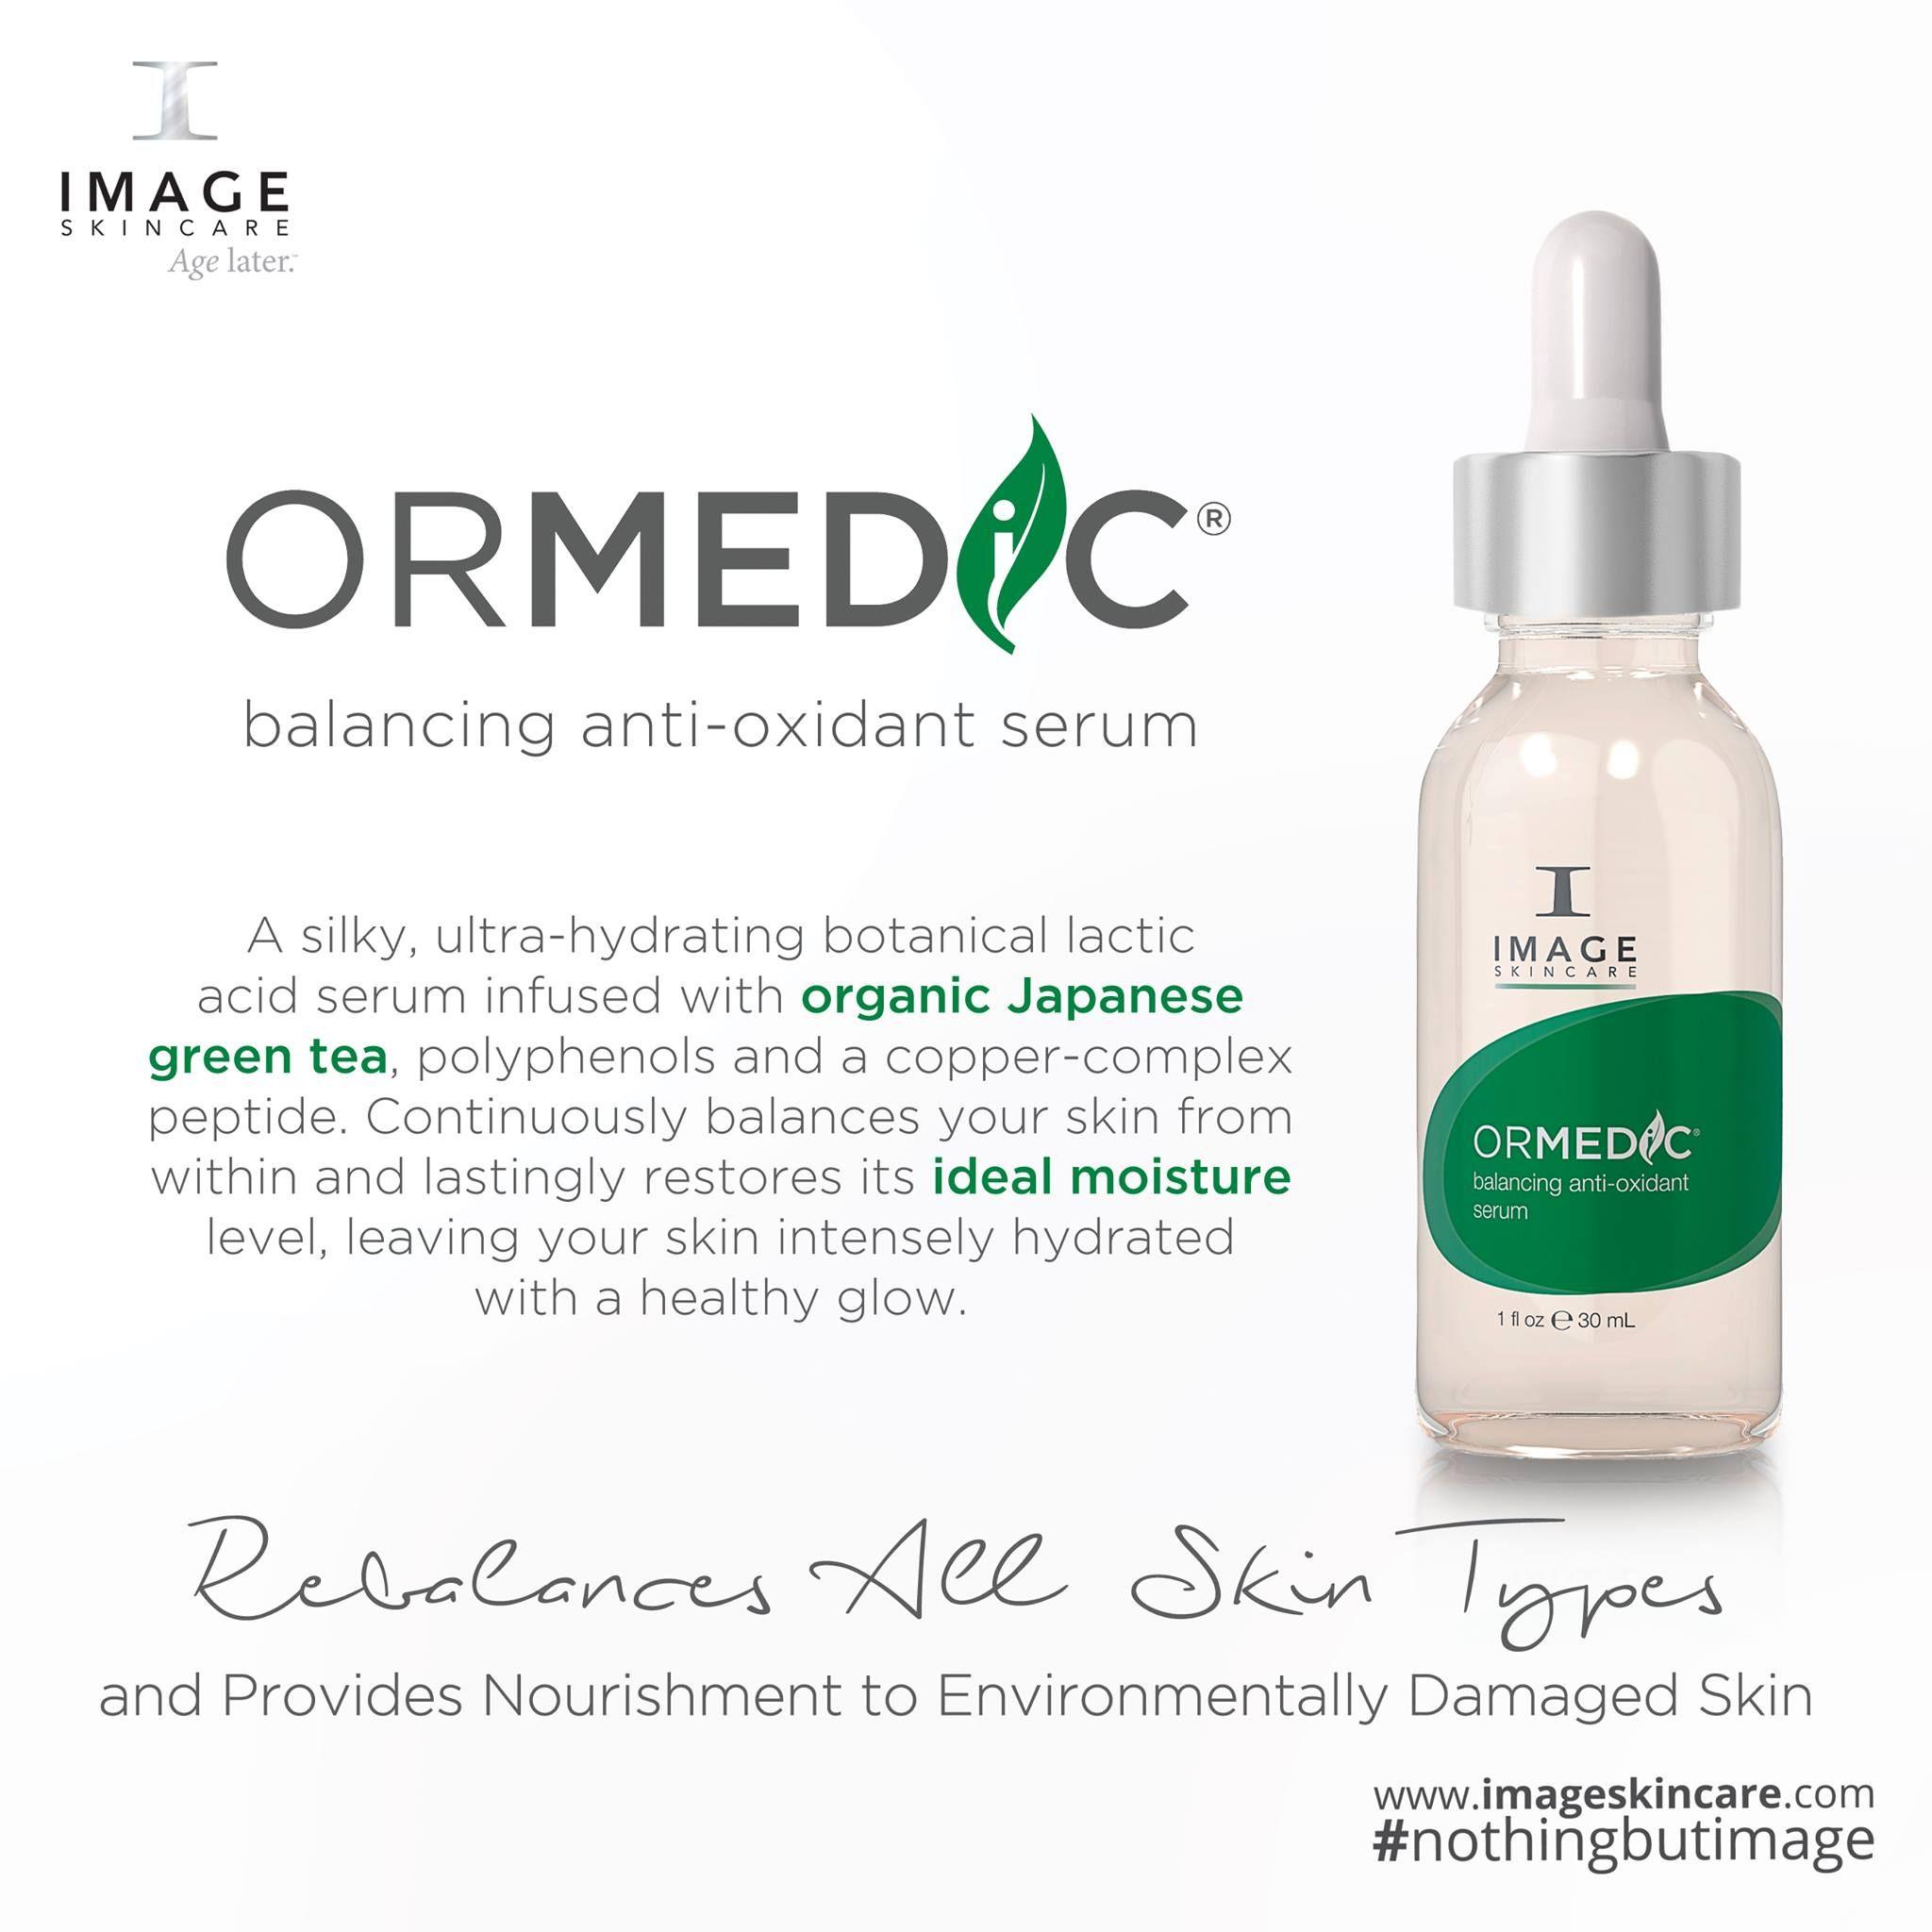 Ormedic Balancing Anti Oxidant Serum Image Skincare Skin Care